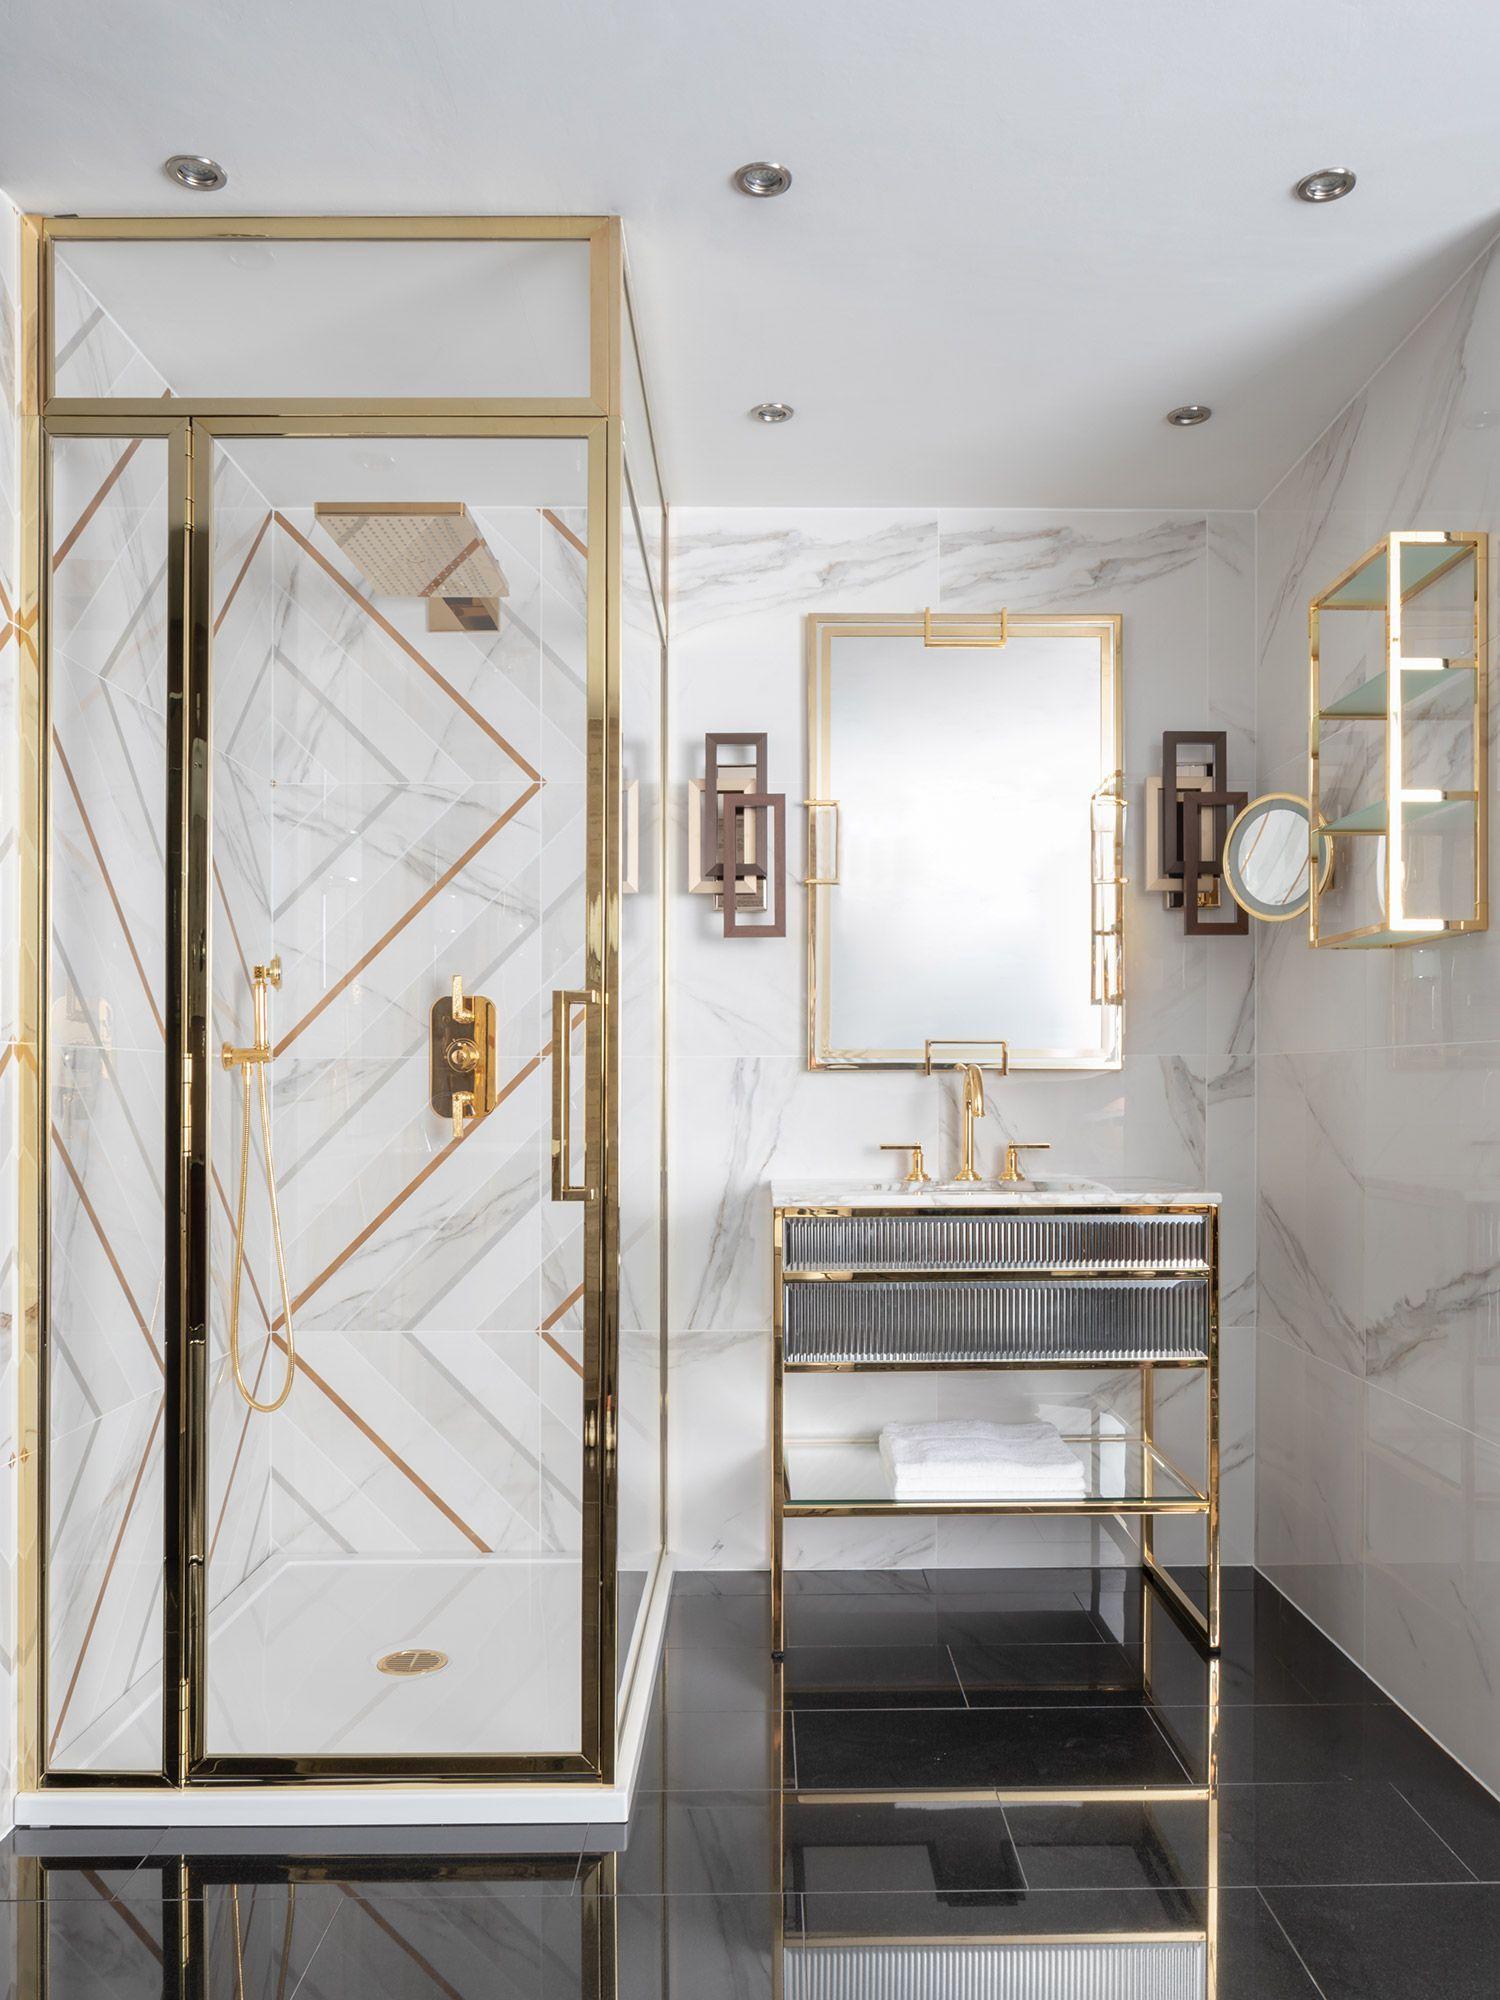 Photo of Badezimmer im Hotelstil – Classica at West One Bathrooms | Badezimmer Inspiration